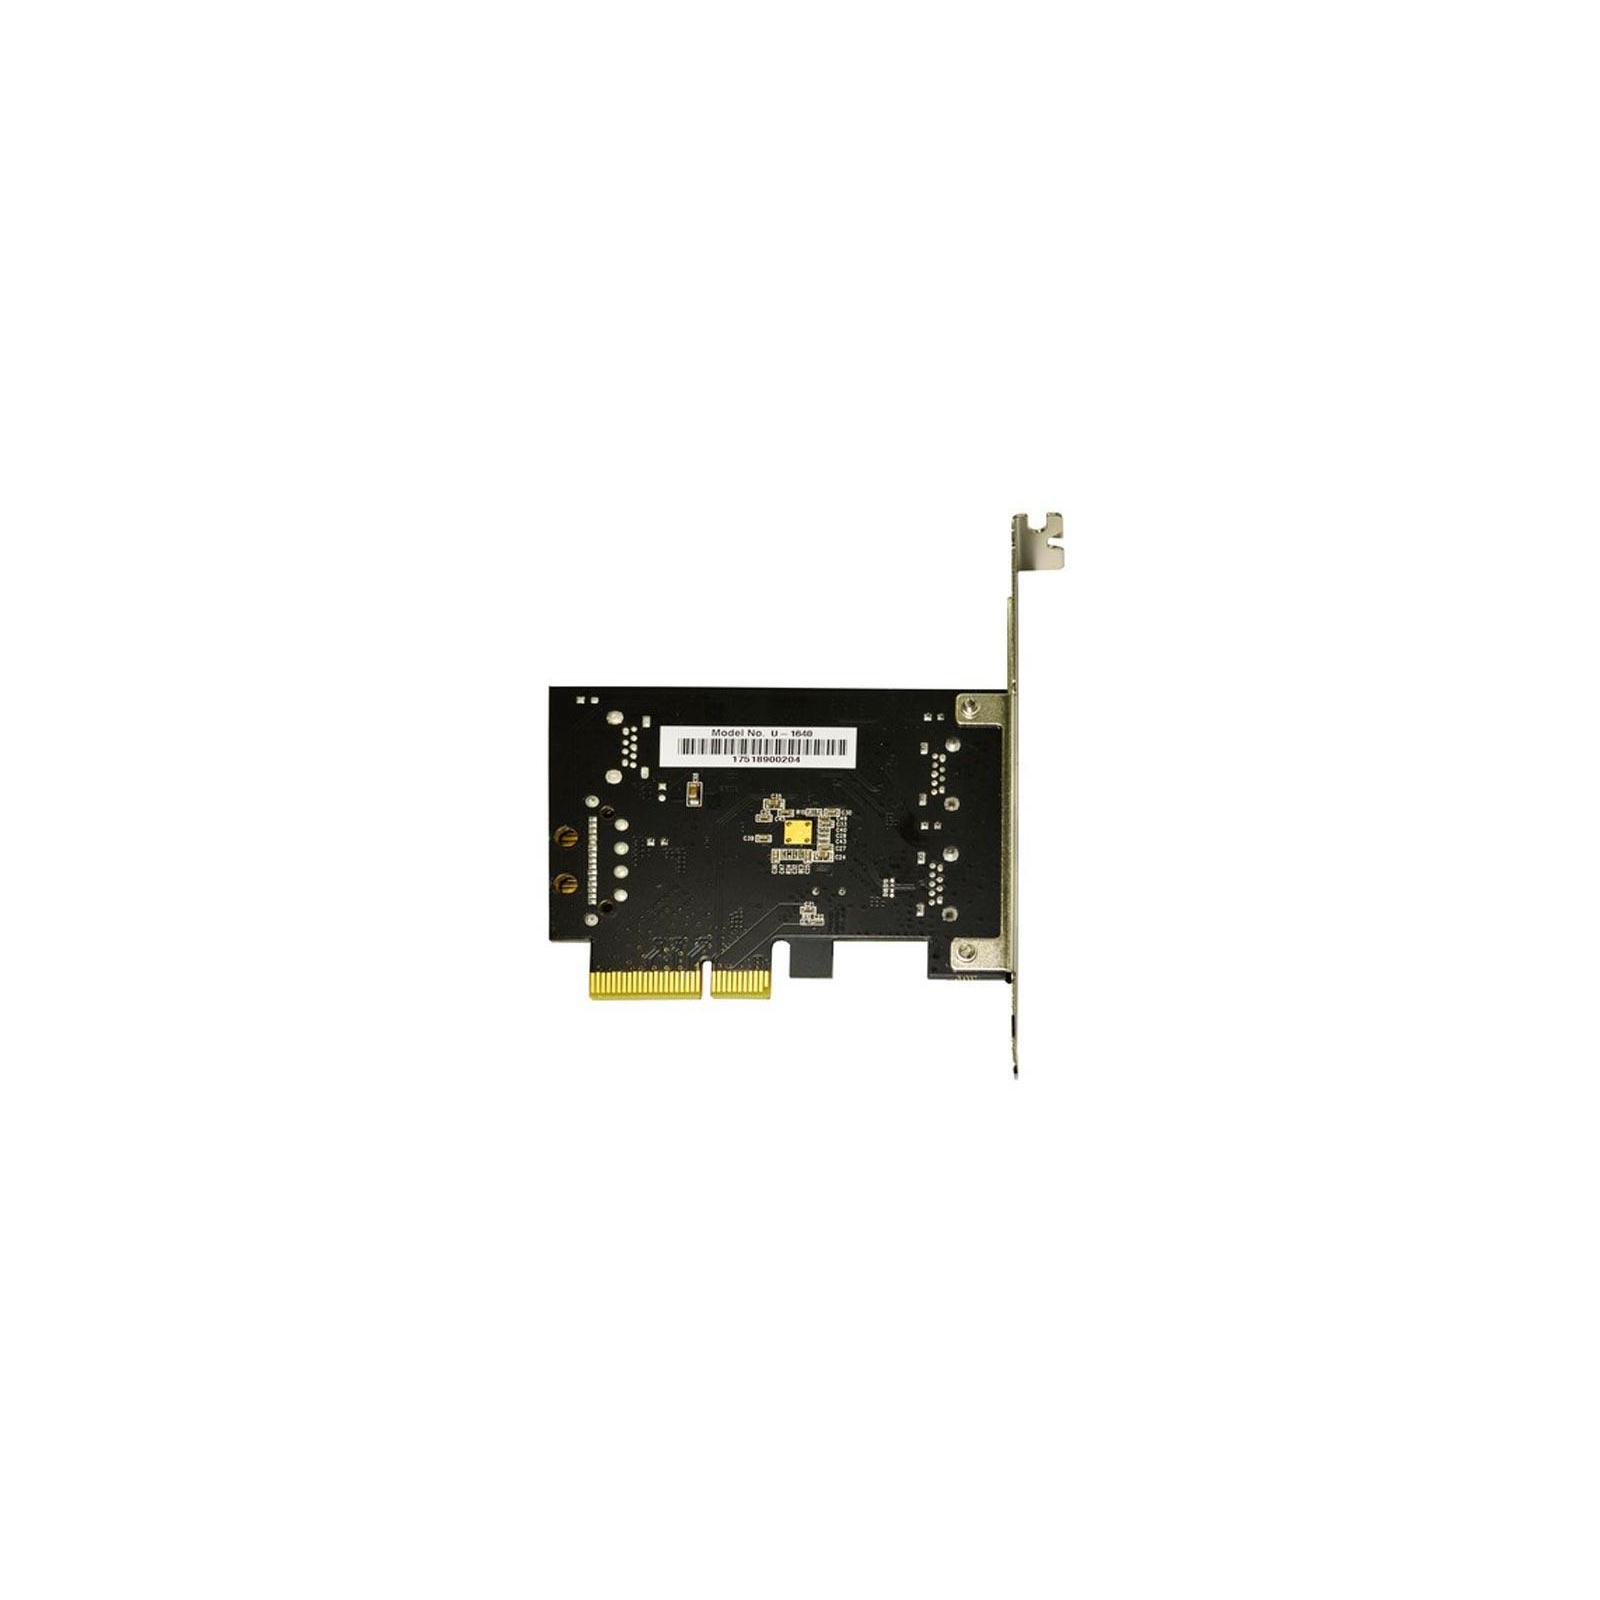 Контроллер PCI to USB3.1 Gen2 2xType-A PCI-E Gen-III x2+планка Low Prof ST-Lab (U-1640) изображение 4